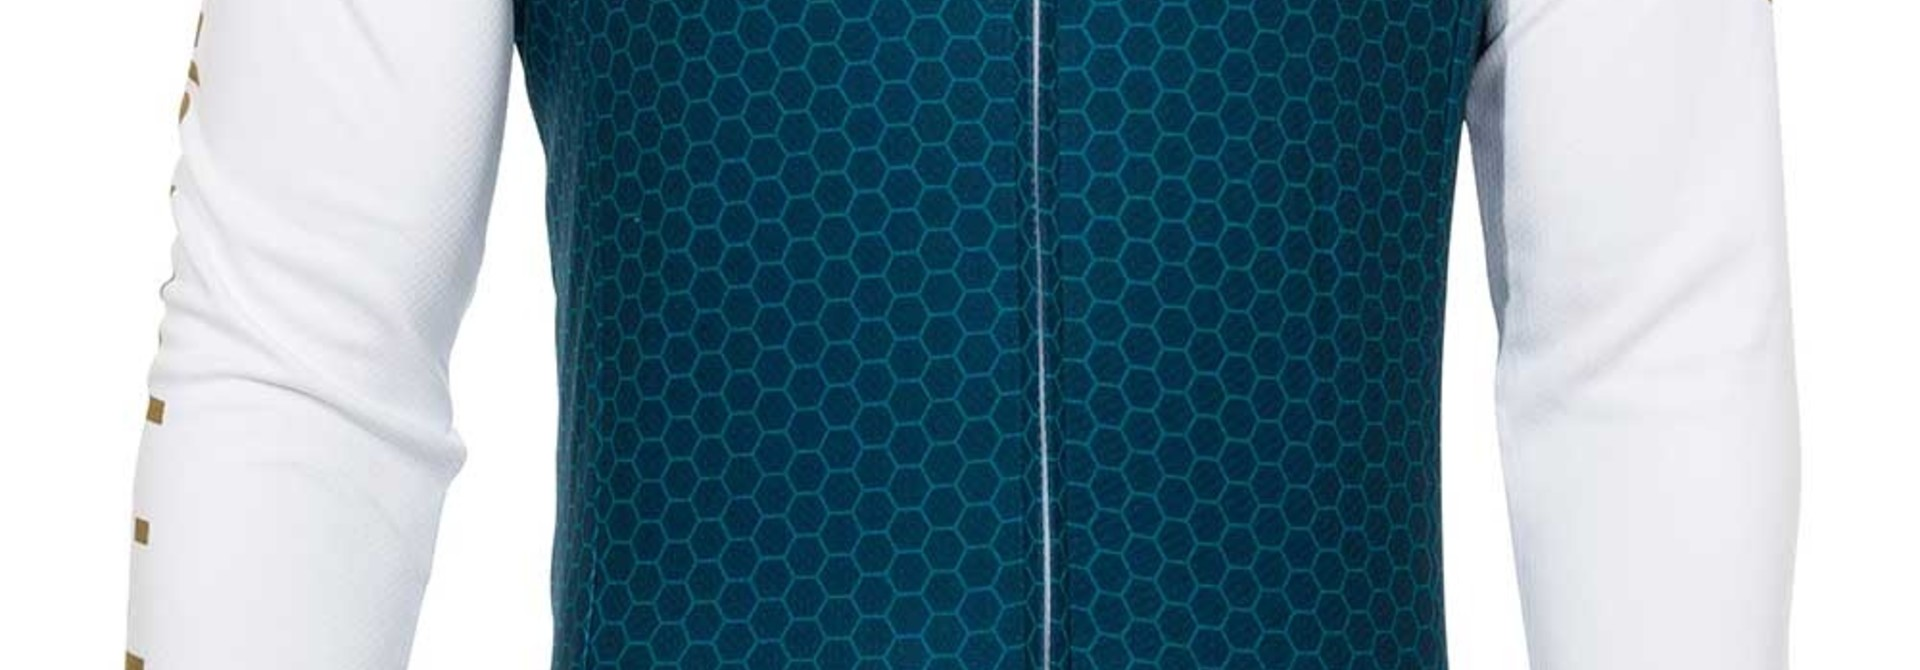 Long Sleeve Bike Jacket Champiosnhip Design